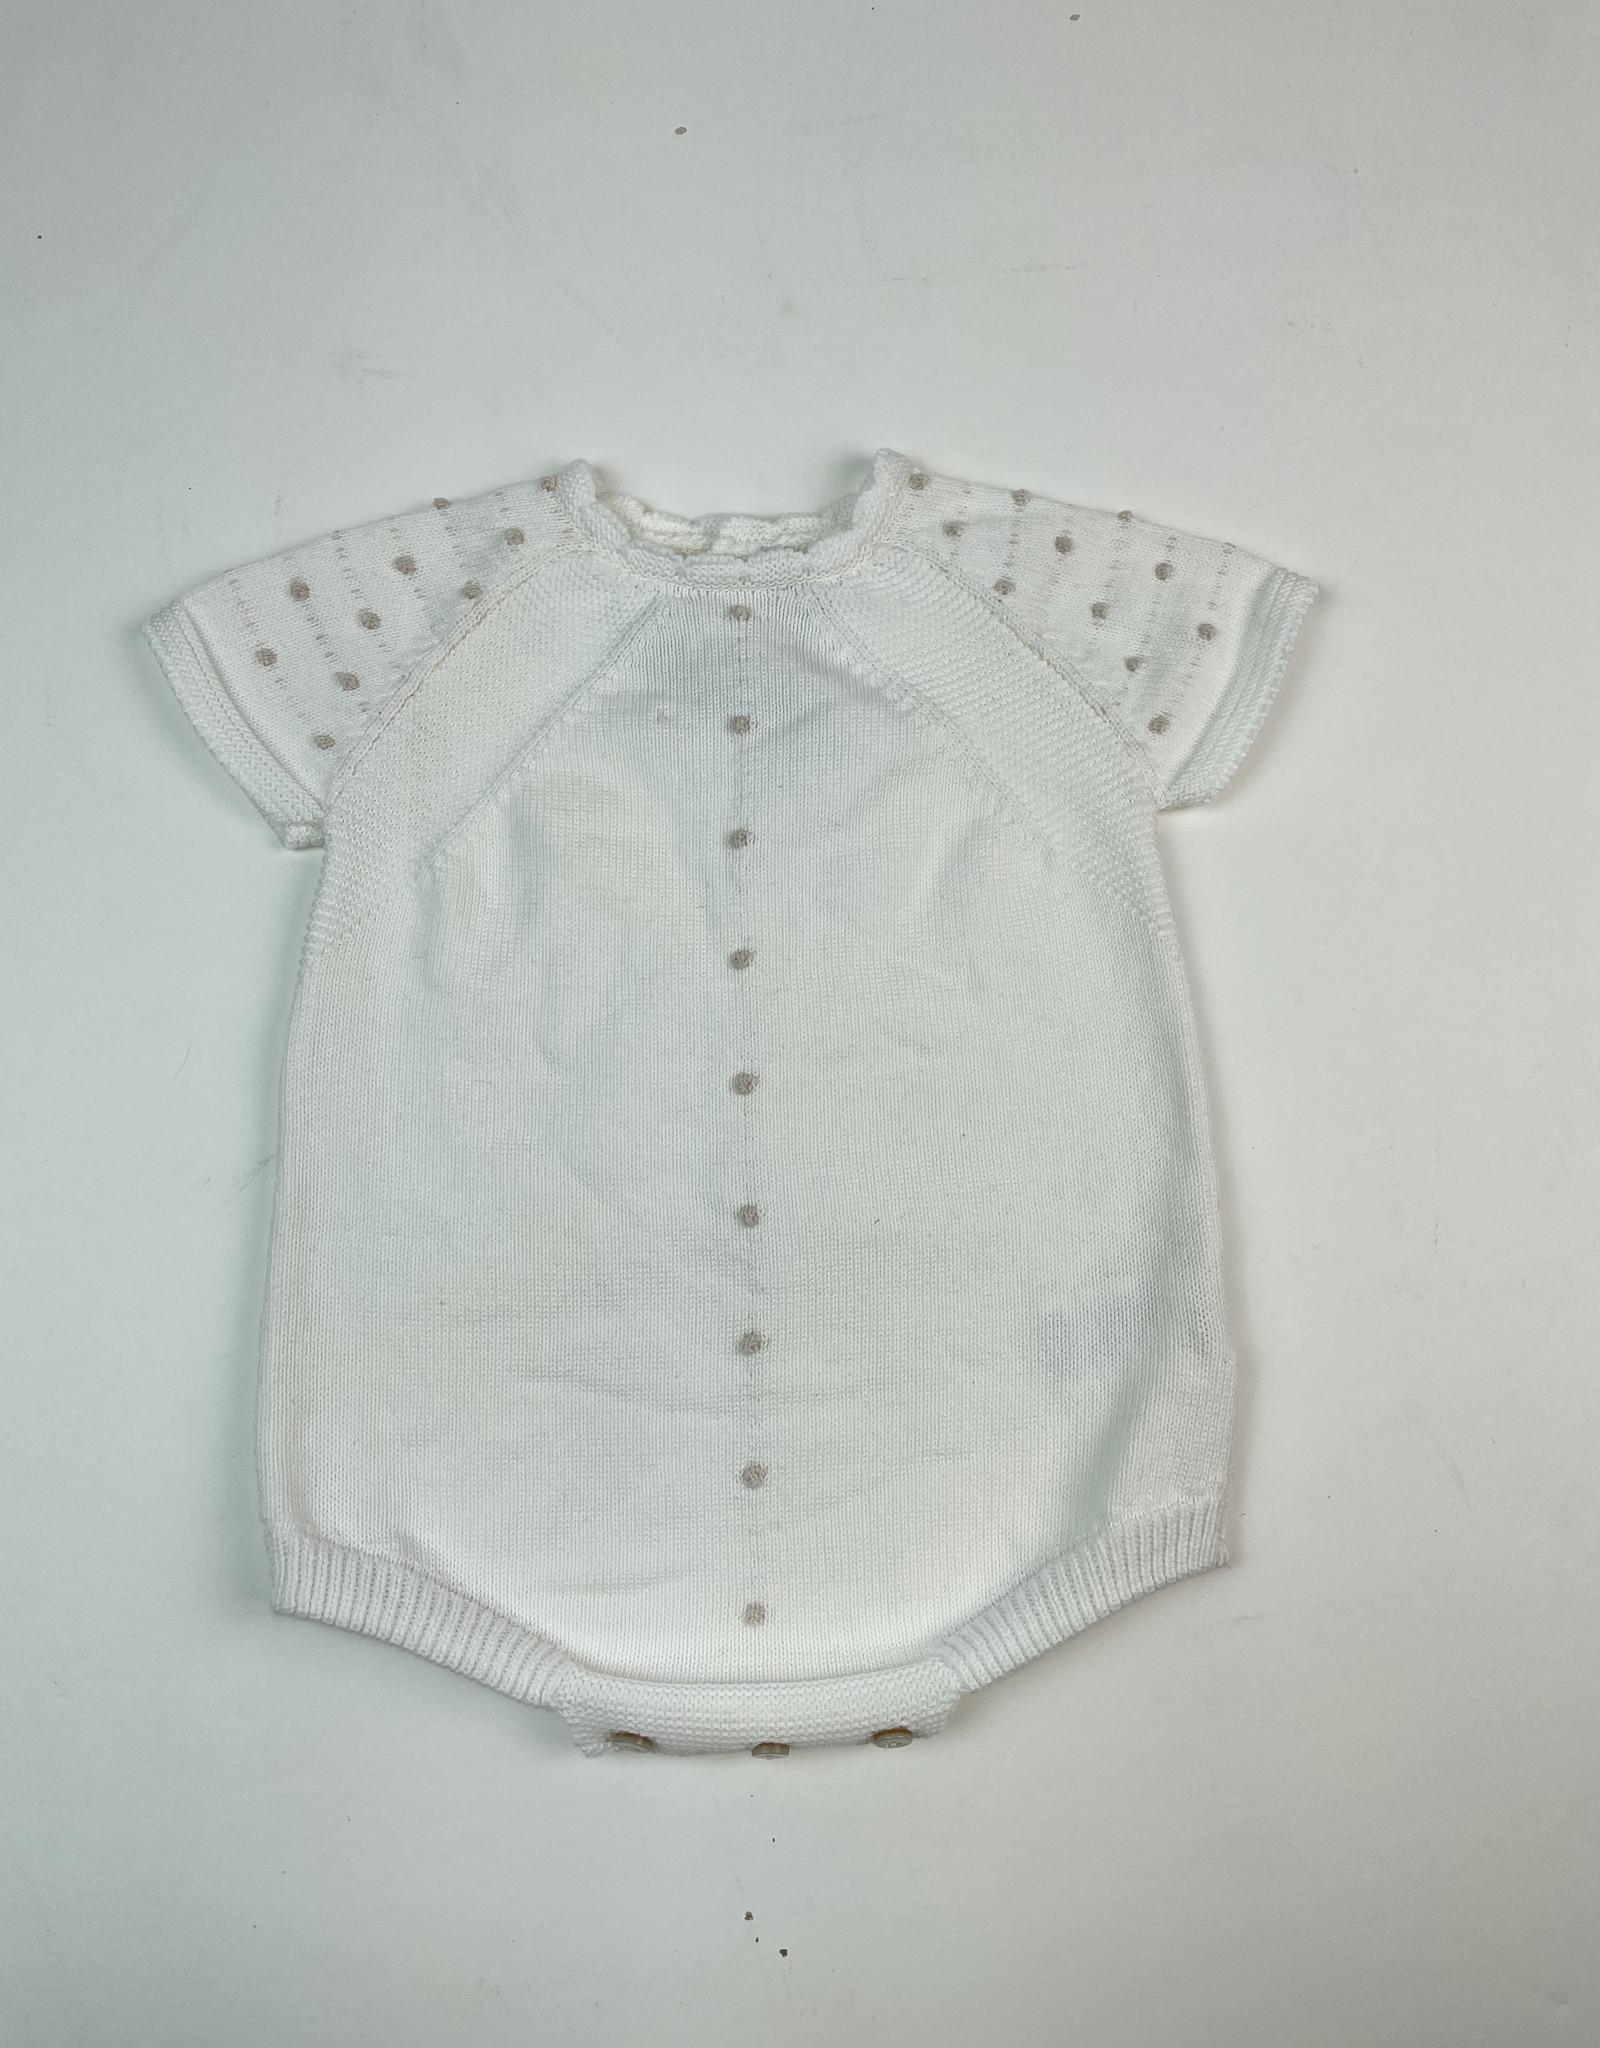 Martin Aranda Knitted Romper Cream With Tan Dots